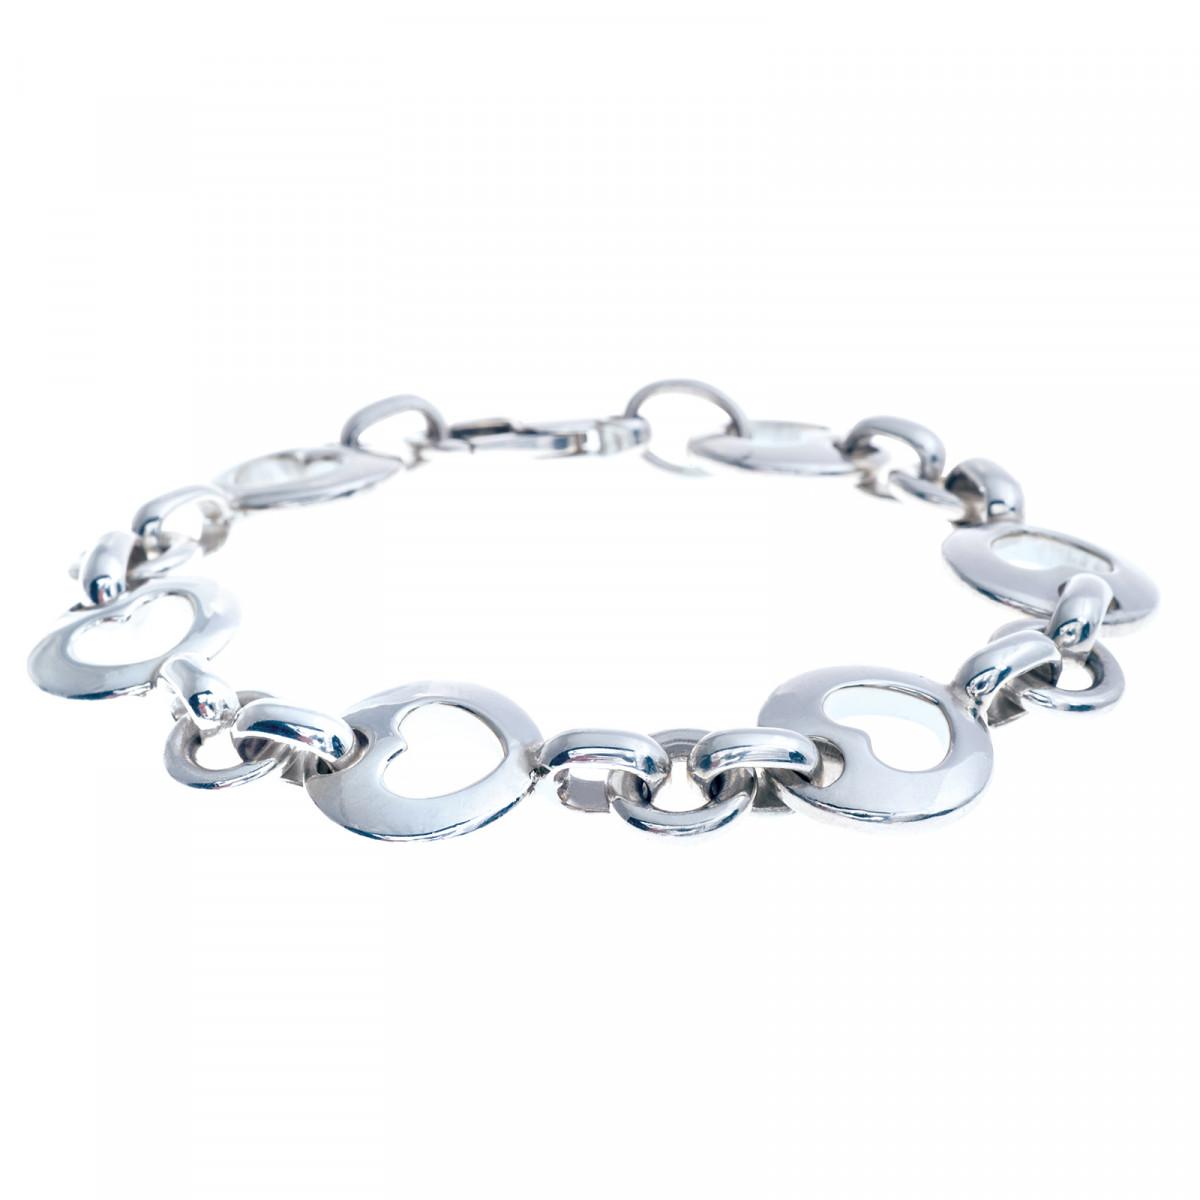 e949ca985 Vintage Tiffany & Co. Heart Circle Bracelet Gallery Image